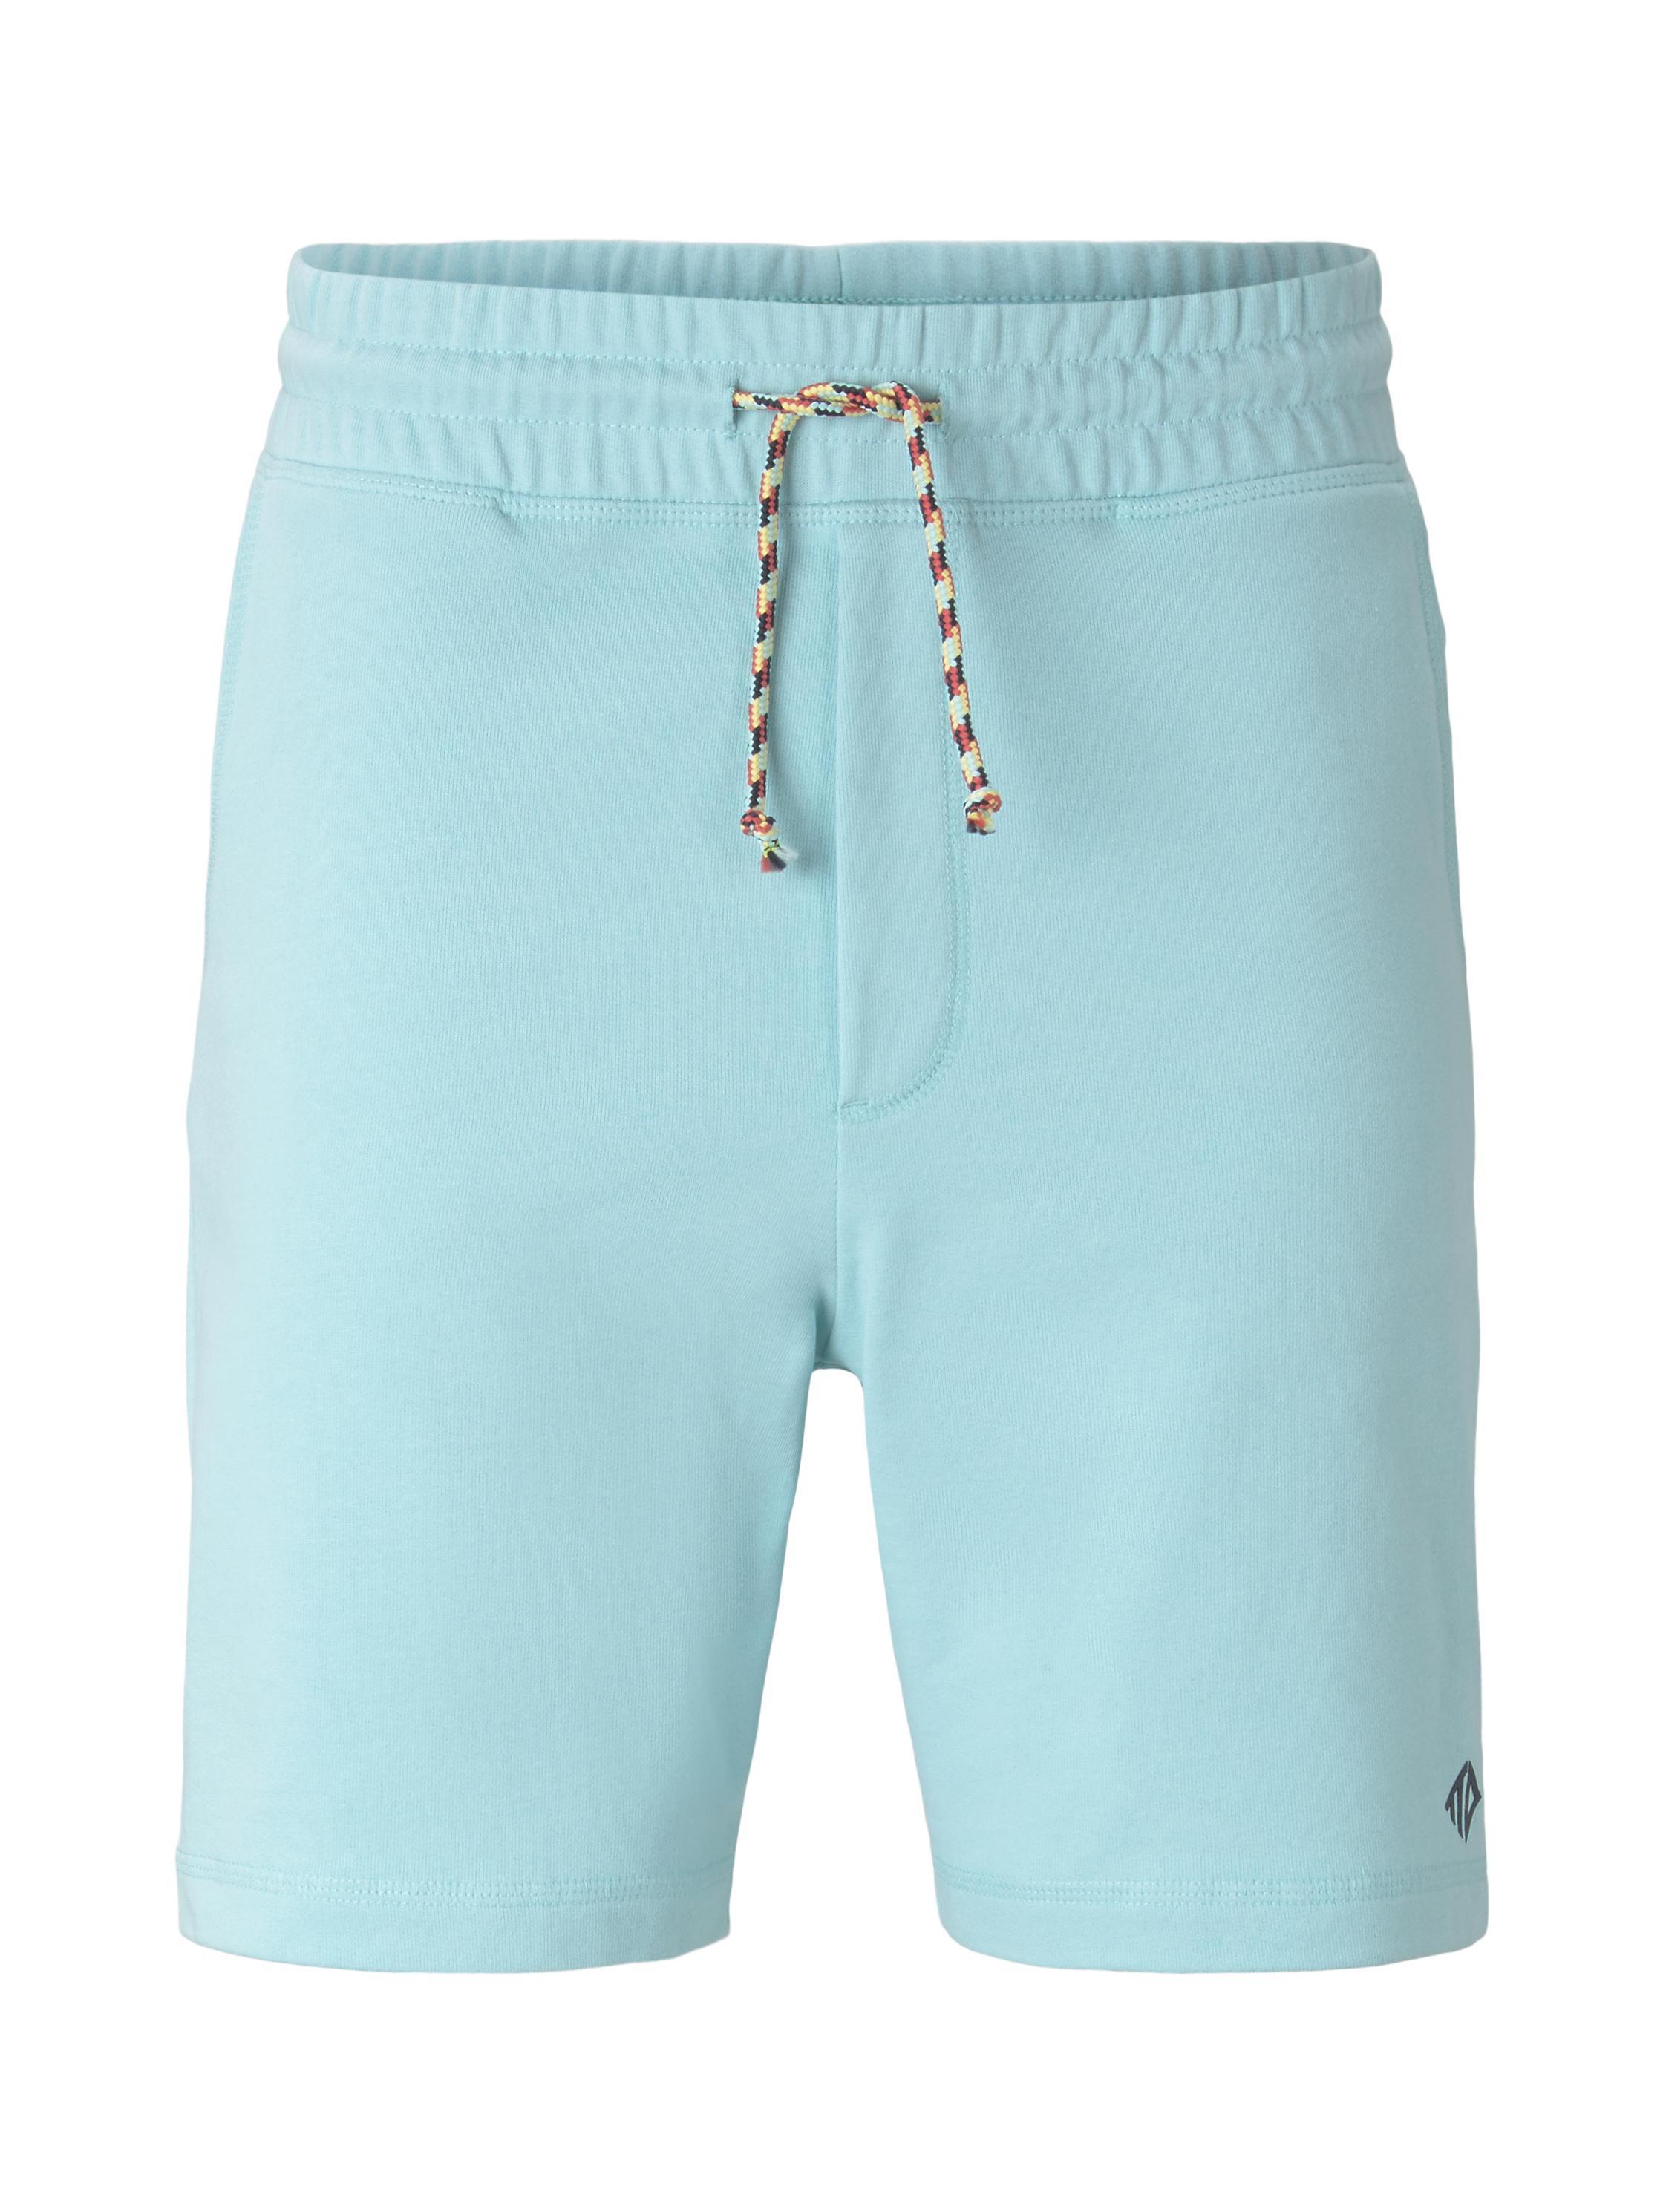 shorts w. print, soft sky blue